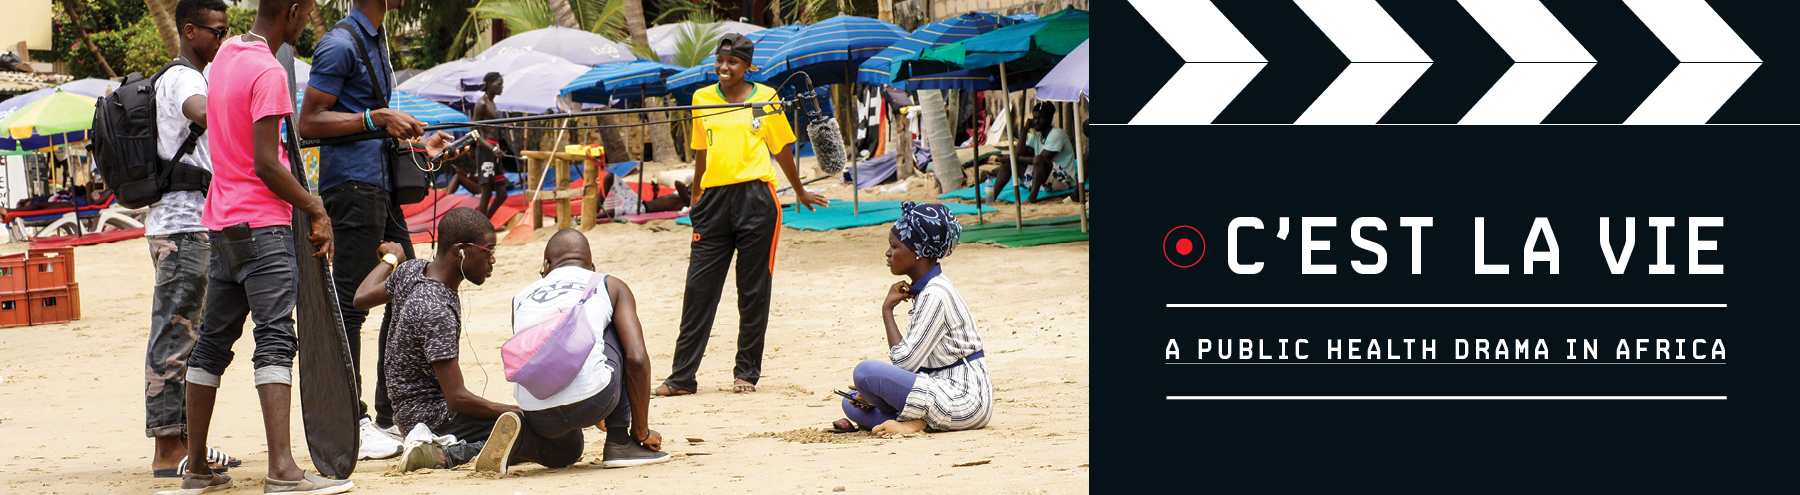 C'est la Vie_A Public Health Drama in Africa